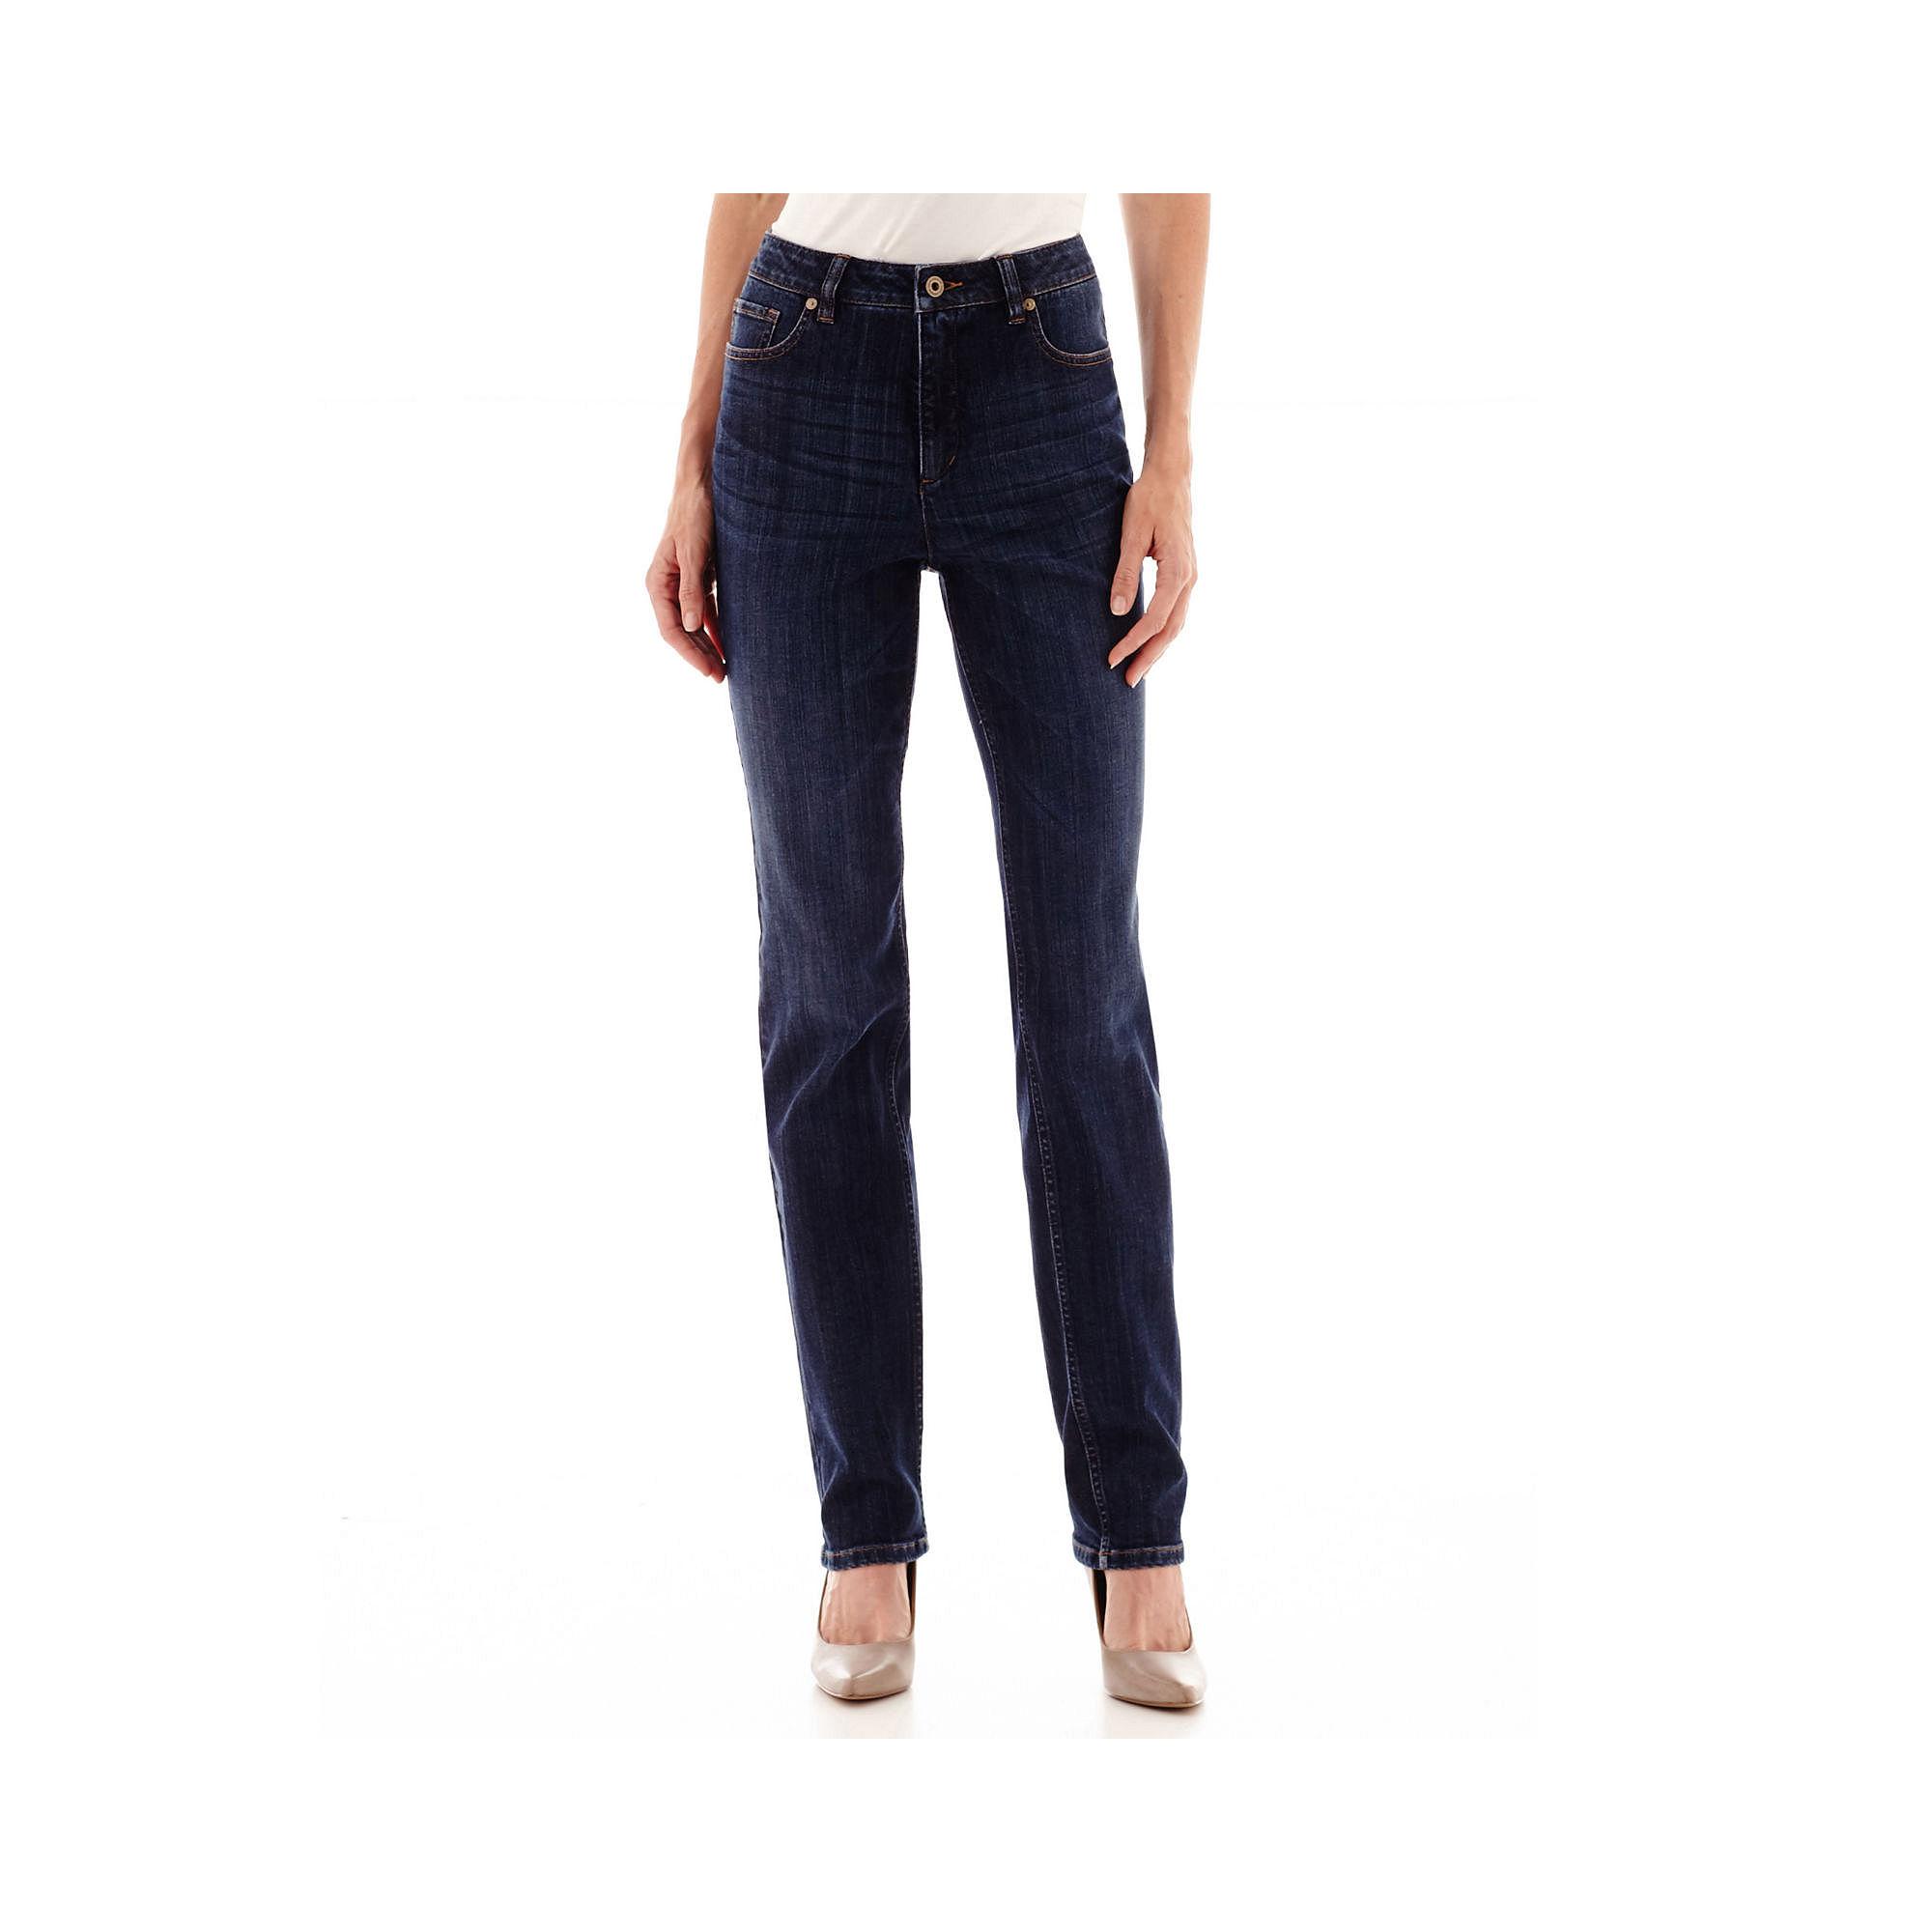 Liz Claiborne Essential Original-Fit Jeans - Tall